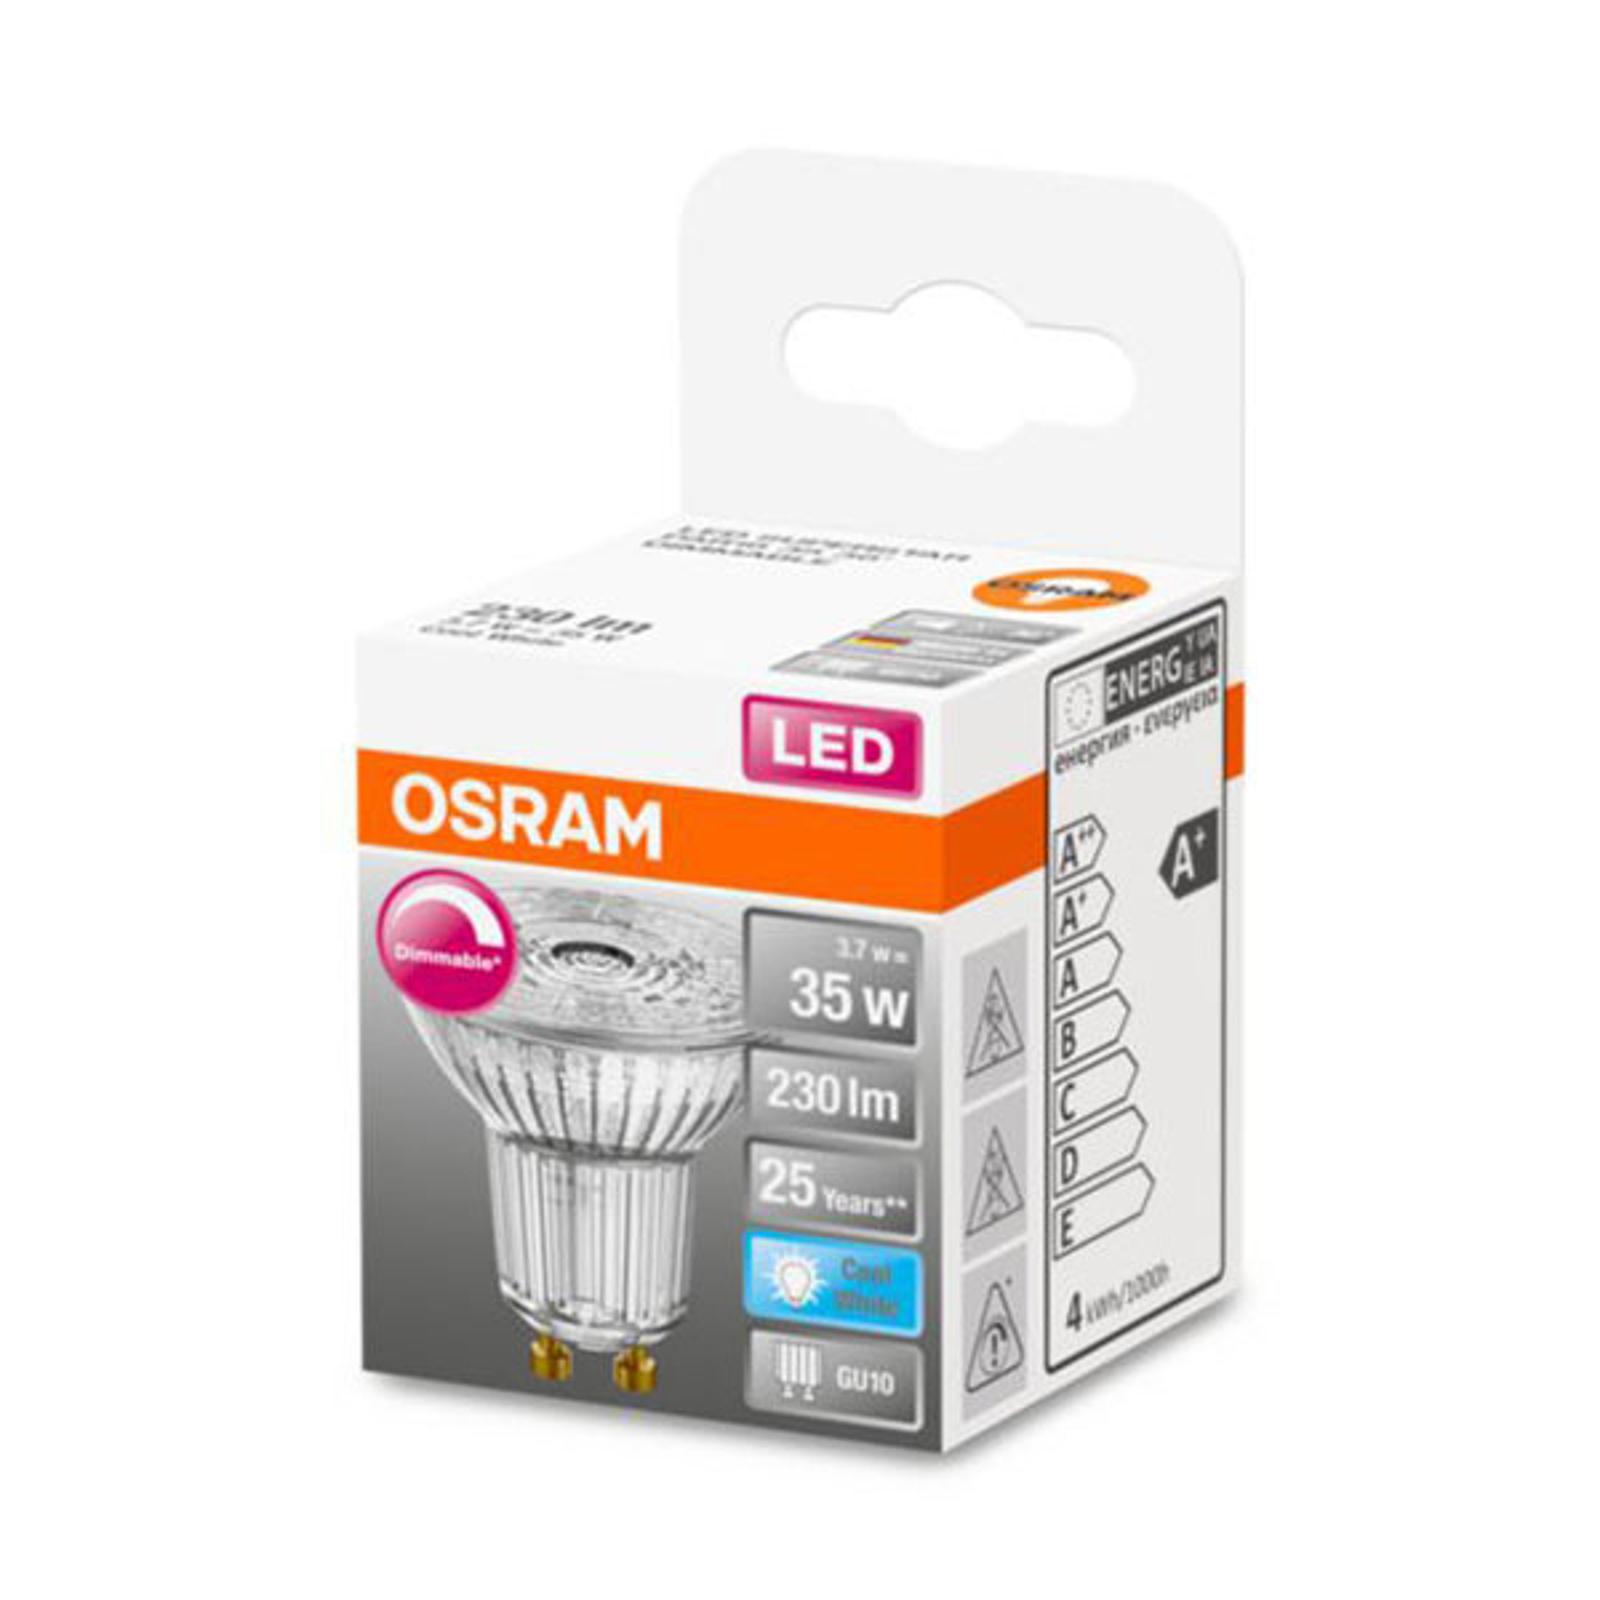 OSRAM-LED-lasi-heijastin GU10 3,7W 940 36° dim